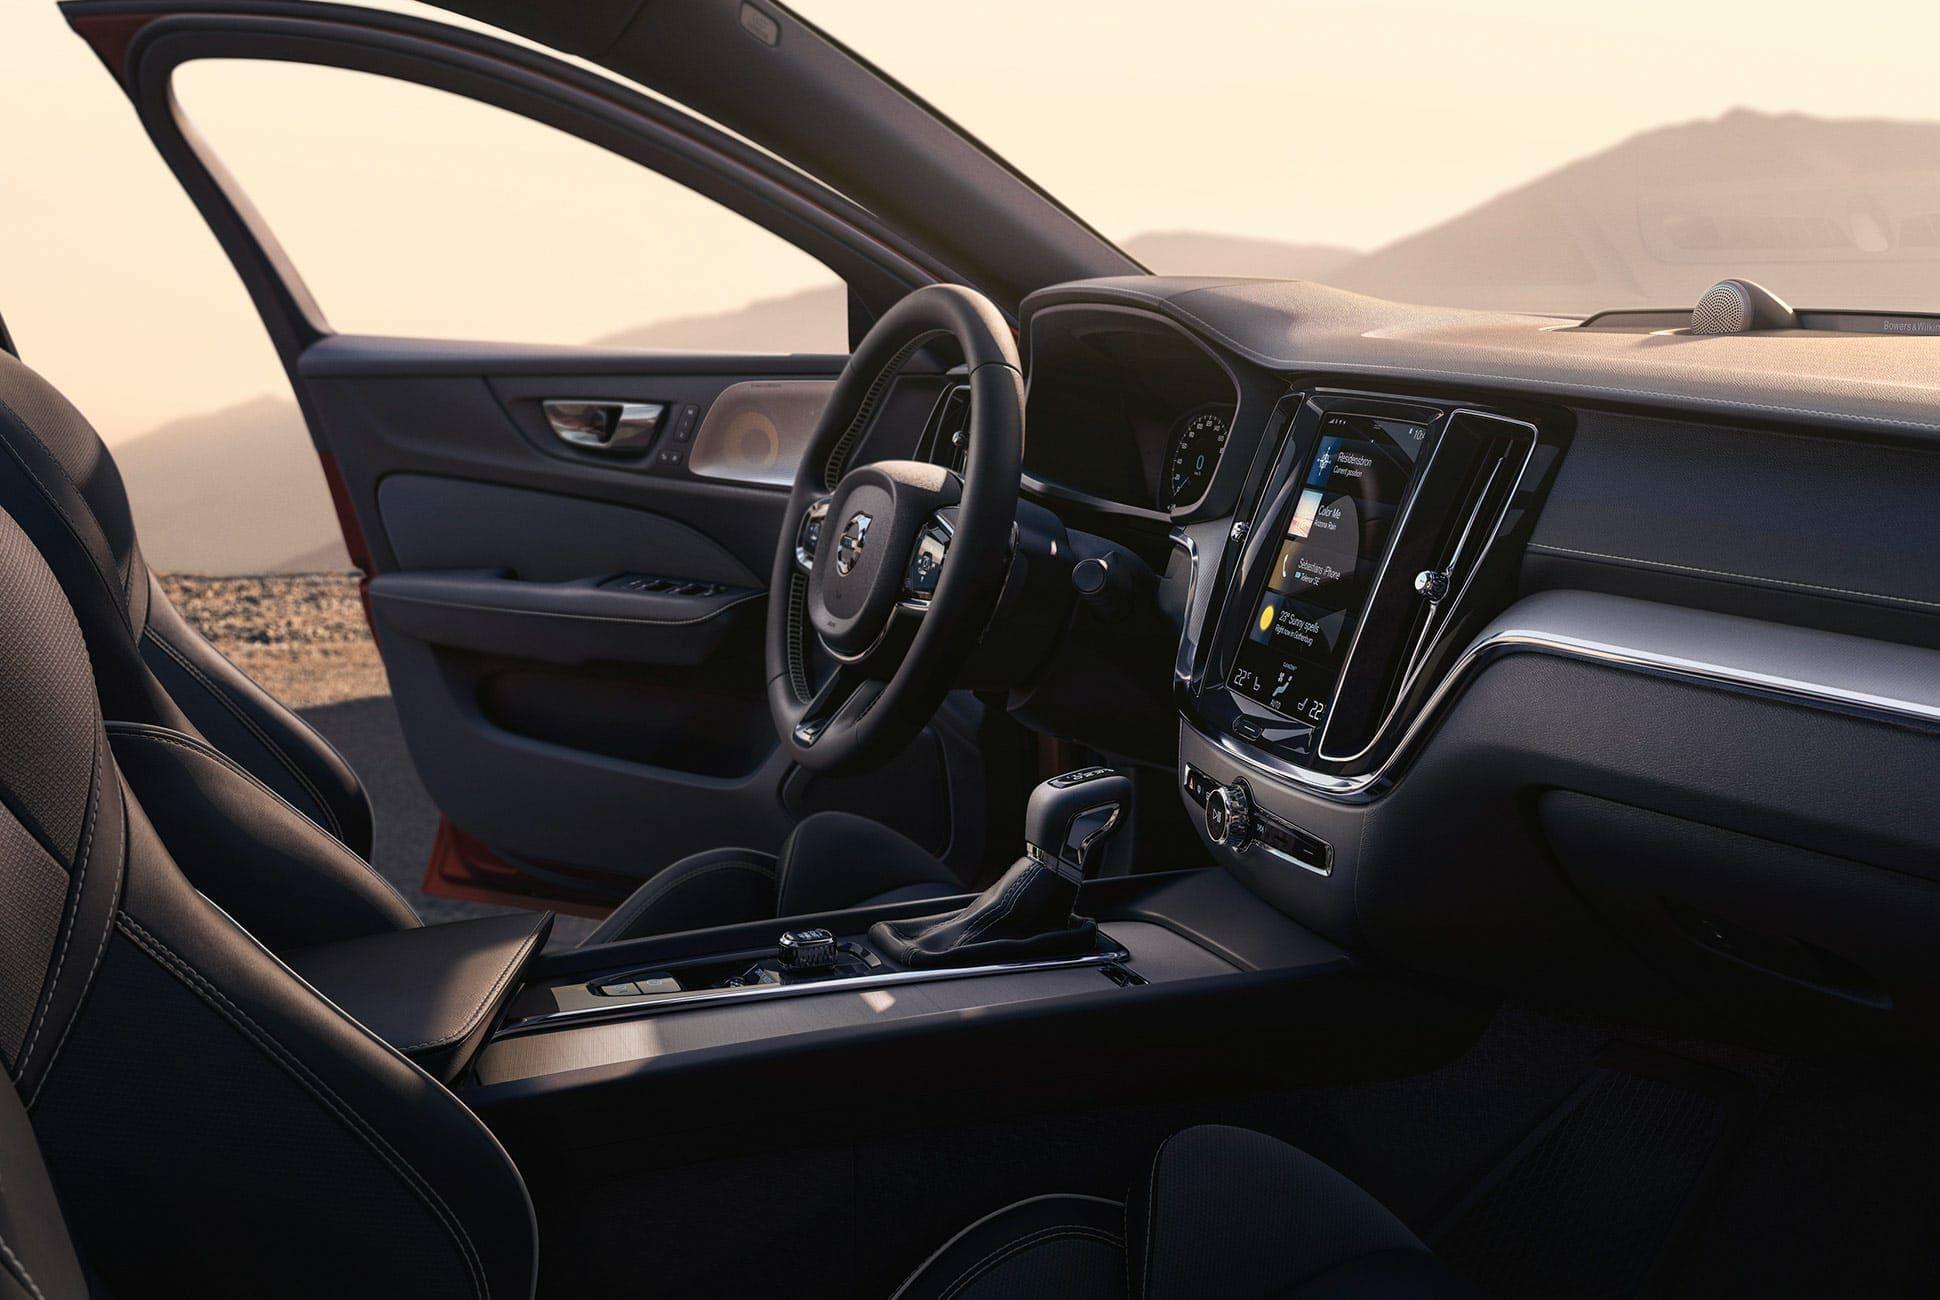 Volvo-S60-Review-gear-patrol-slide-6